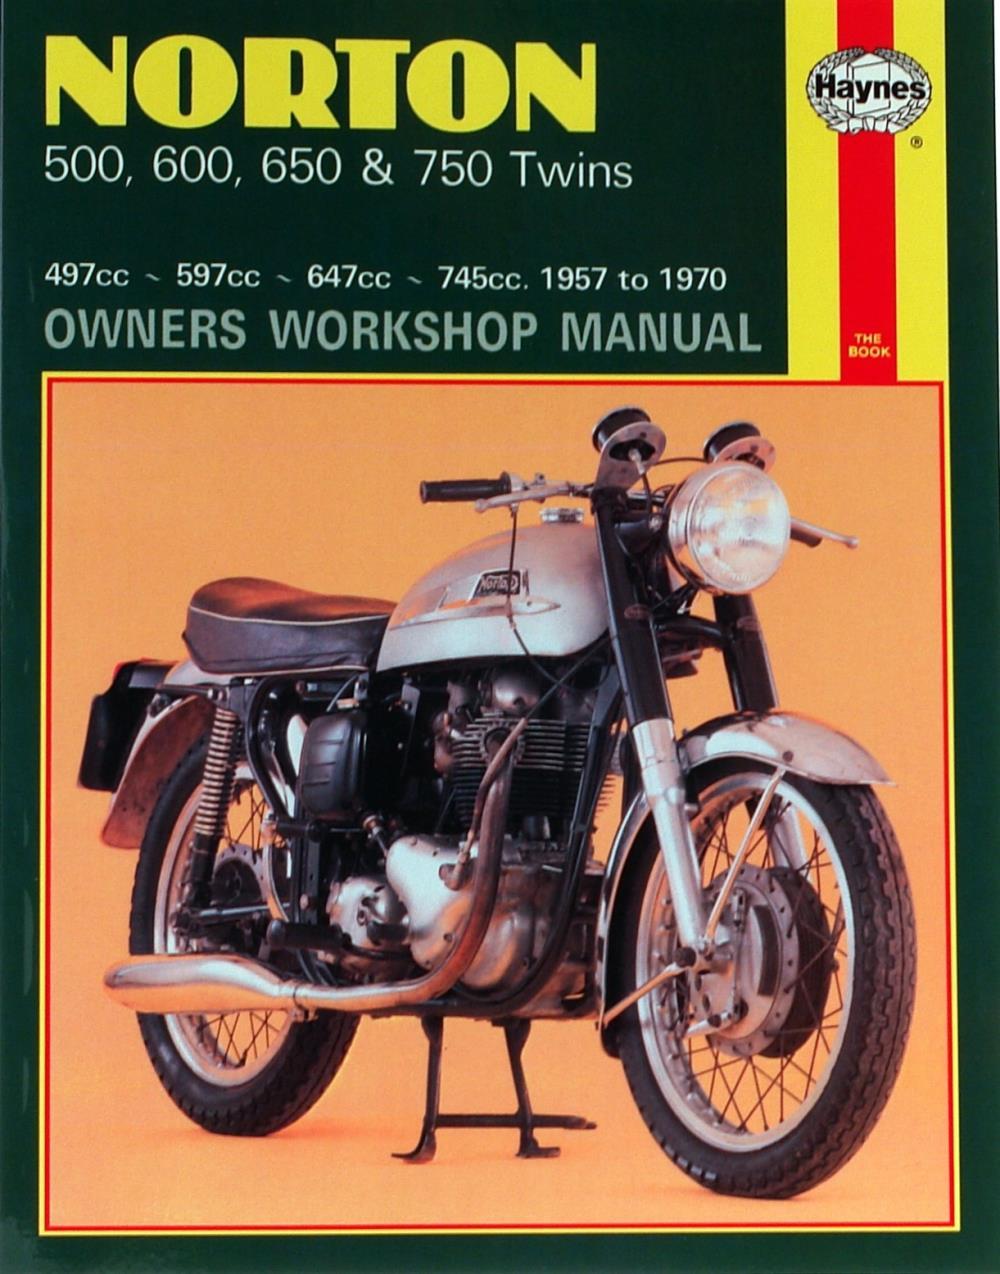 Details about Manual Haynes for 1958 Norton Dominator 88 (497cc)